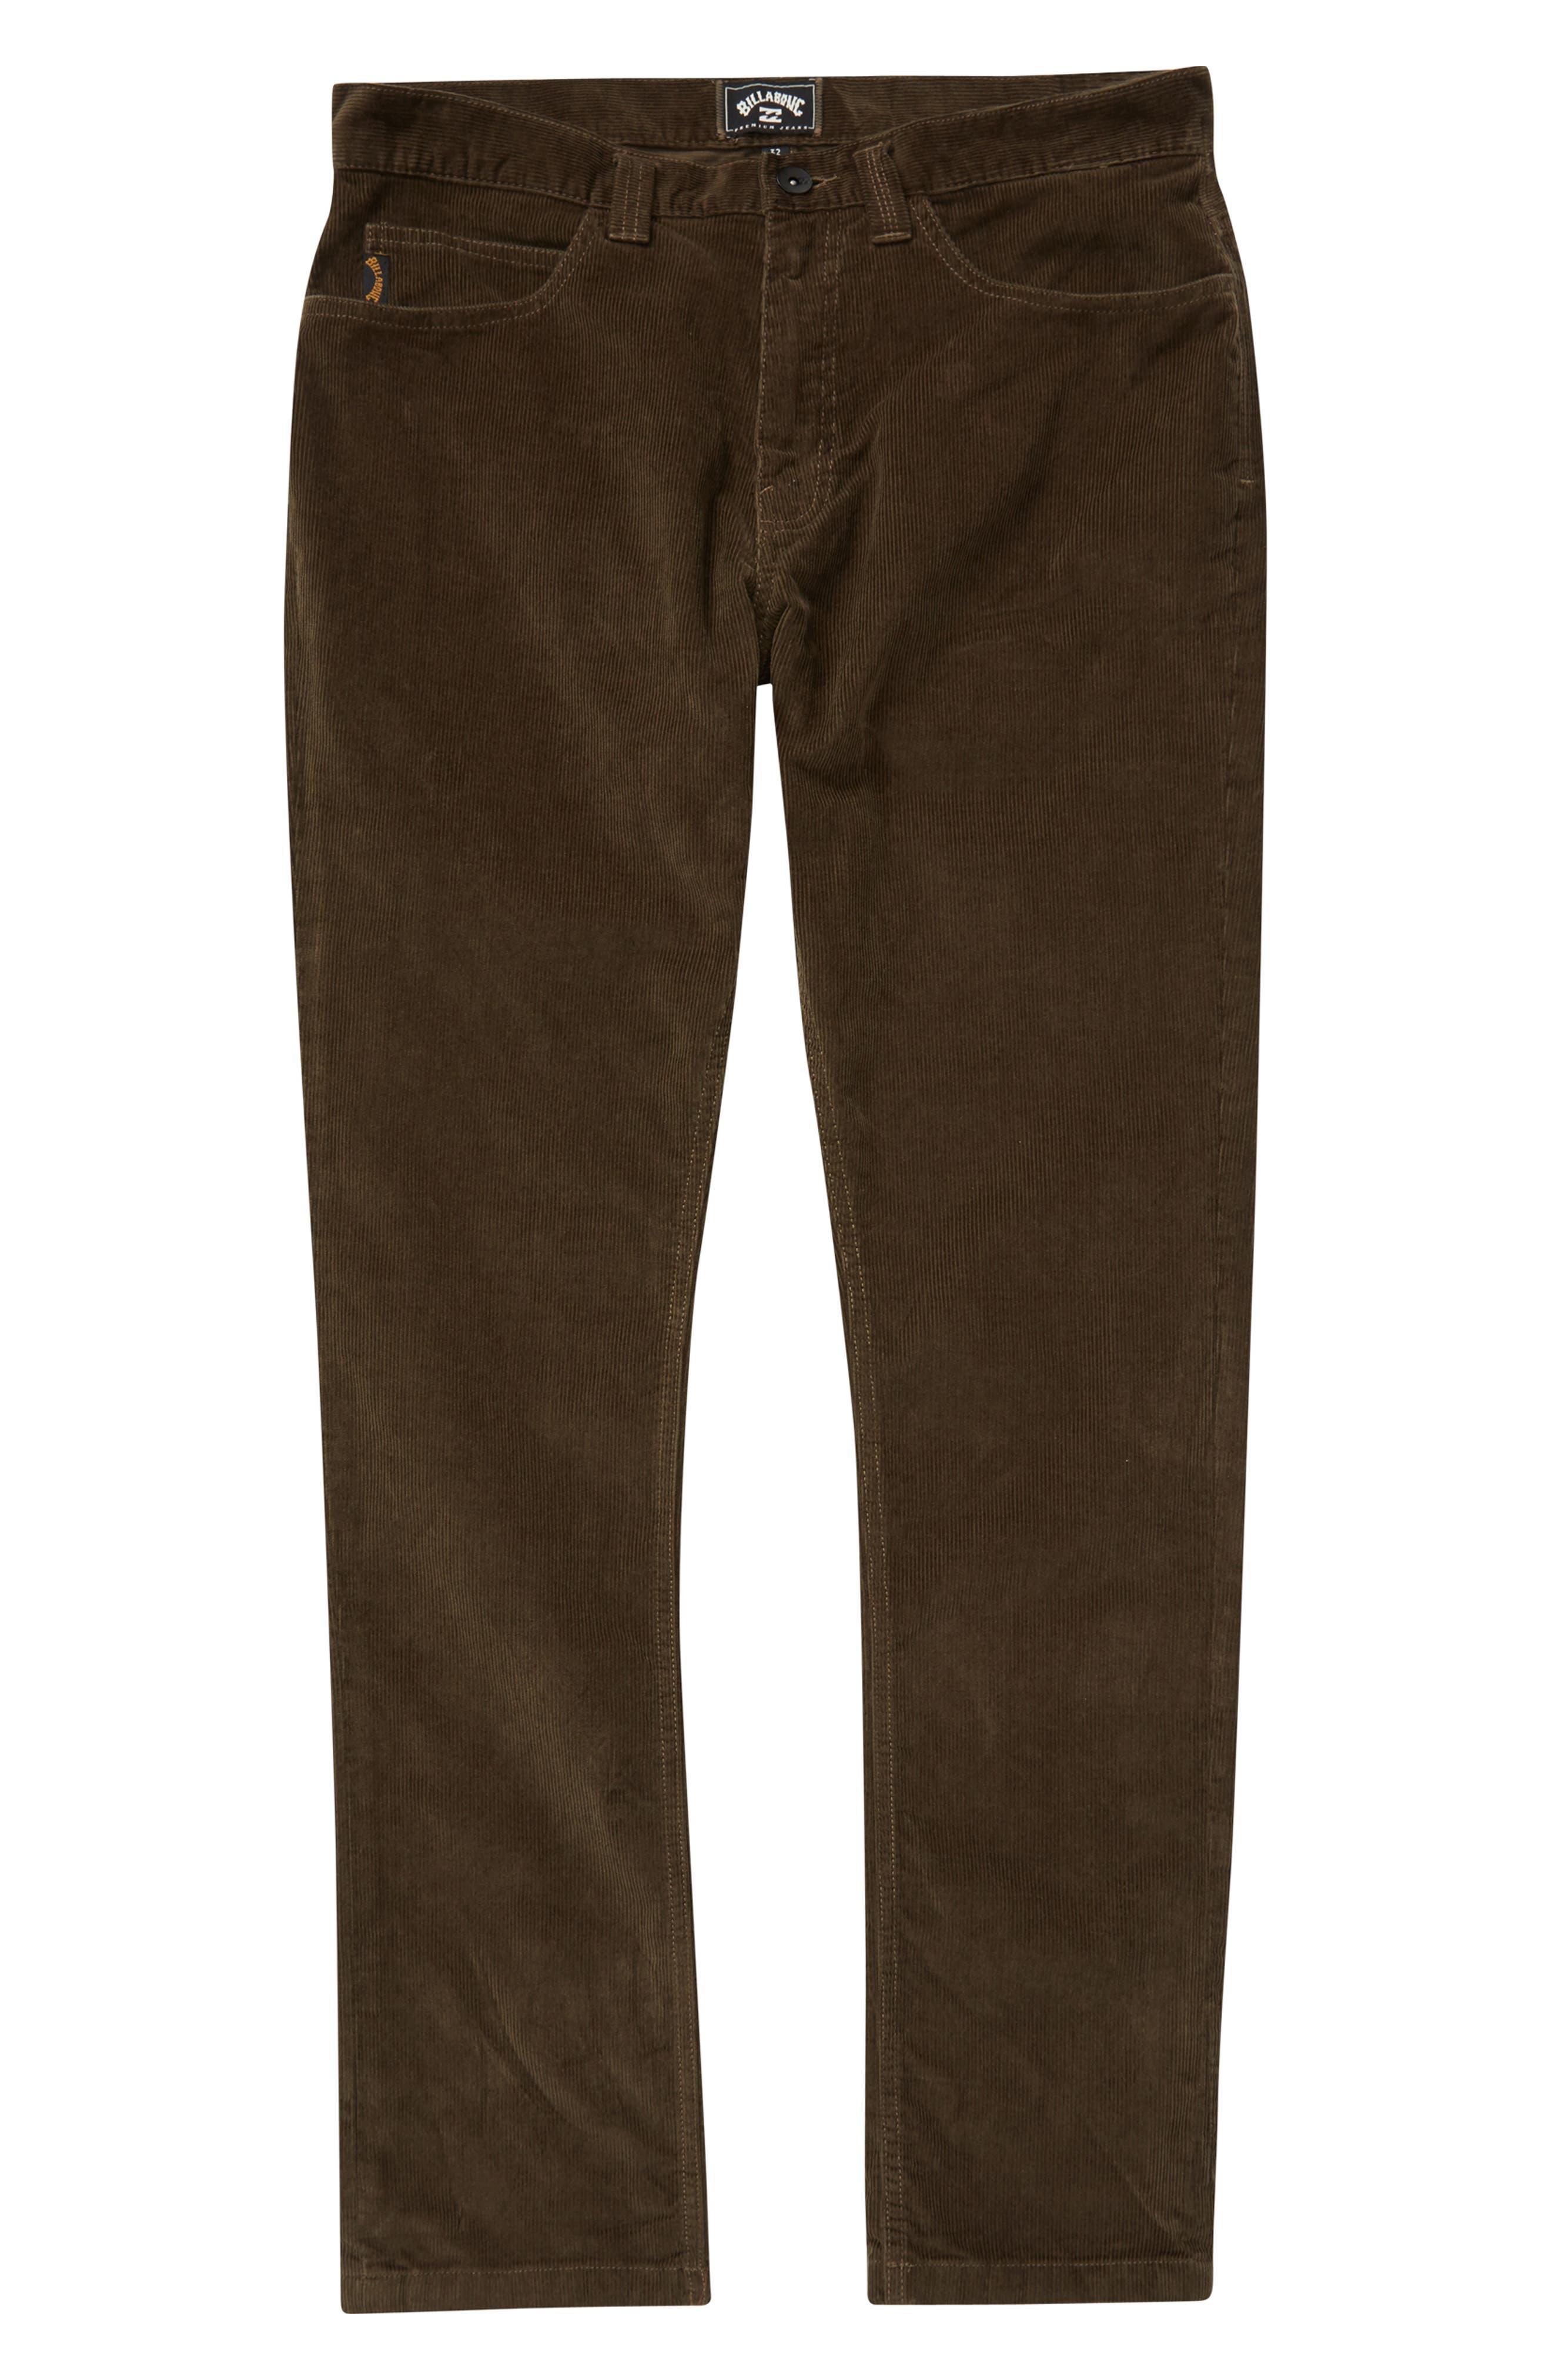 Outsider Corduroy Pants,                         Main,                         color, COFFEE